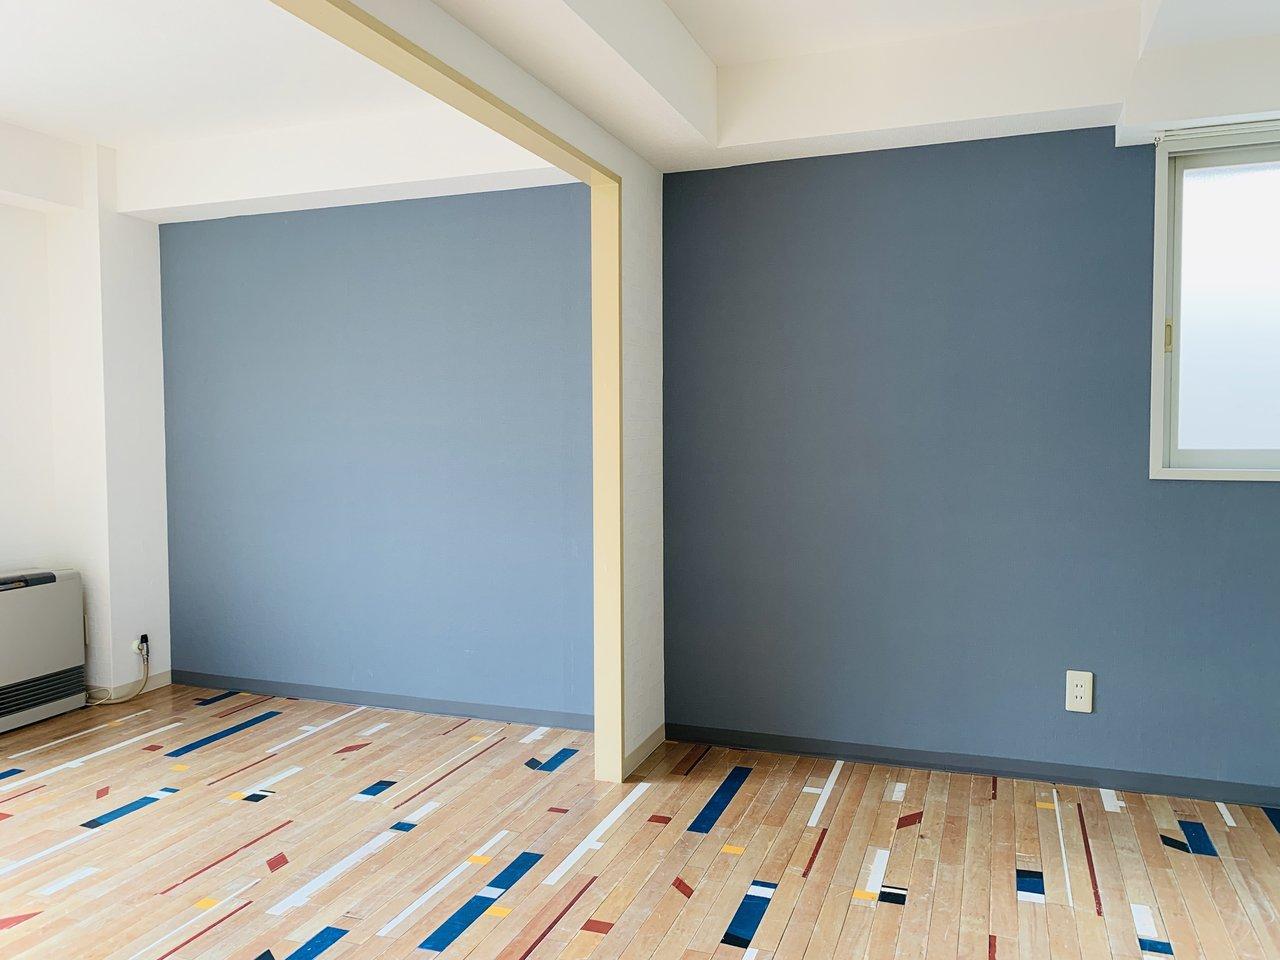 DK部分と洋室を仕切らなければ、より広々と暮らせます。両方合わせて13畳ほどの広さになりますよ。